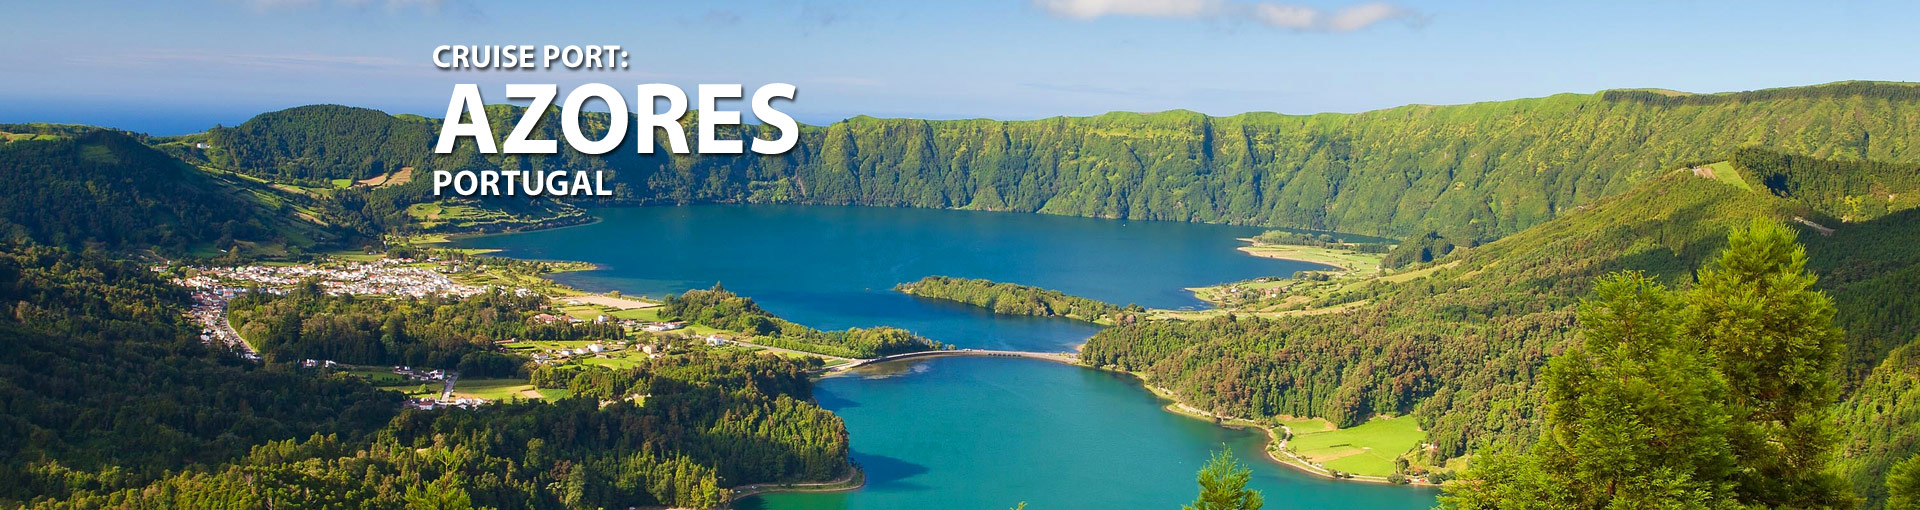 Cruises from Ponta Delgada, Azores, Portugal